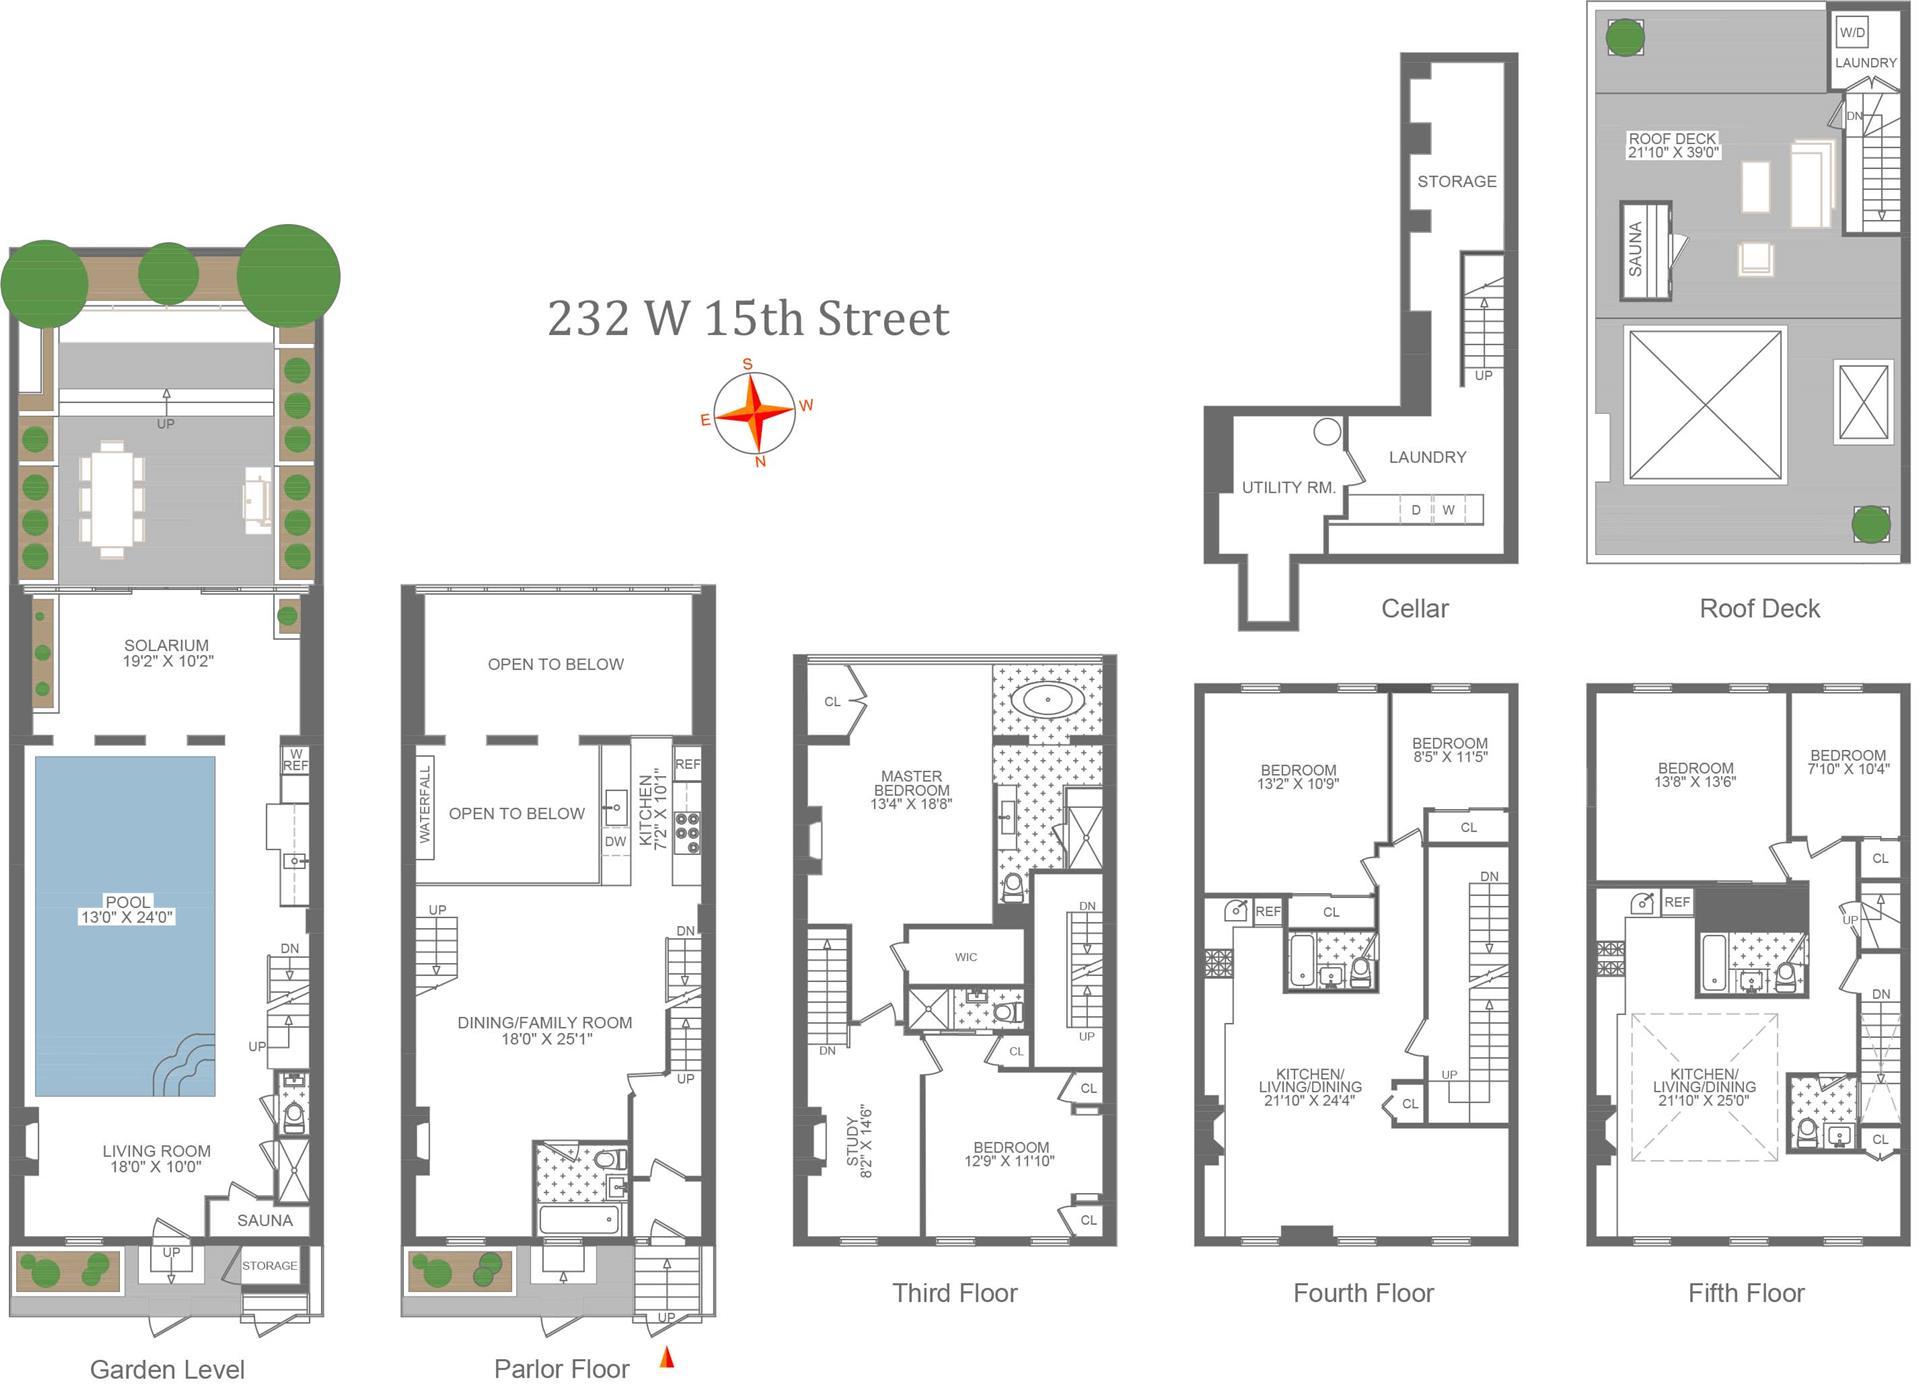 Floor plan of 232 West 15th St - Chelsea, New York